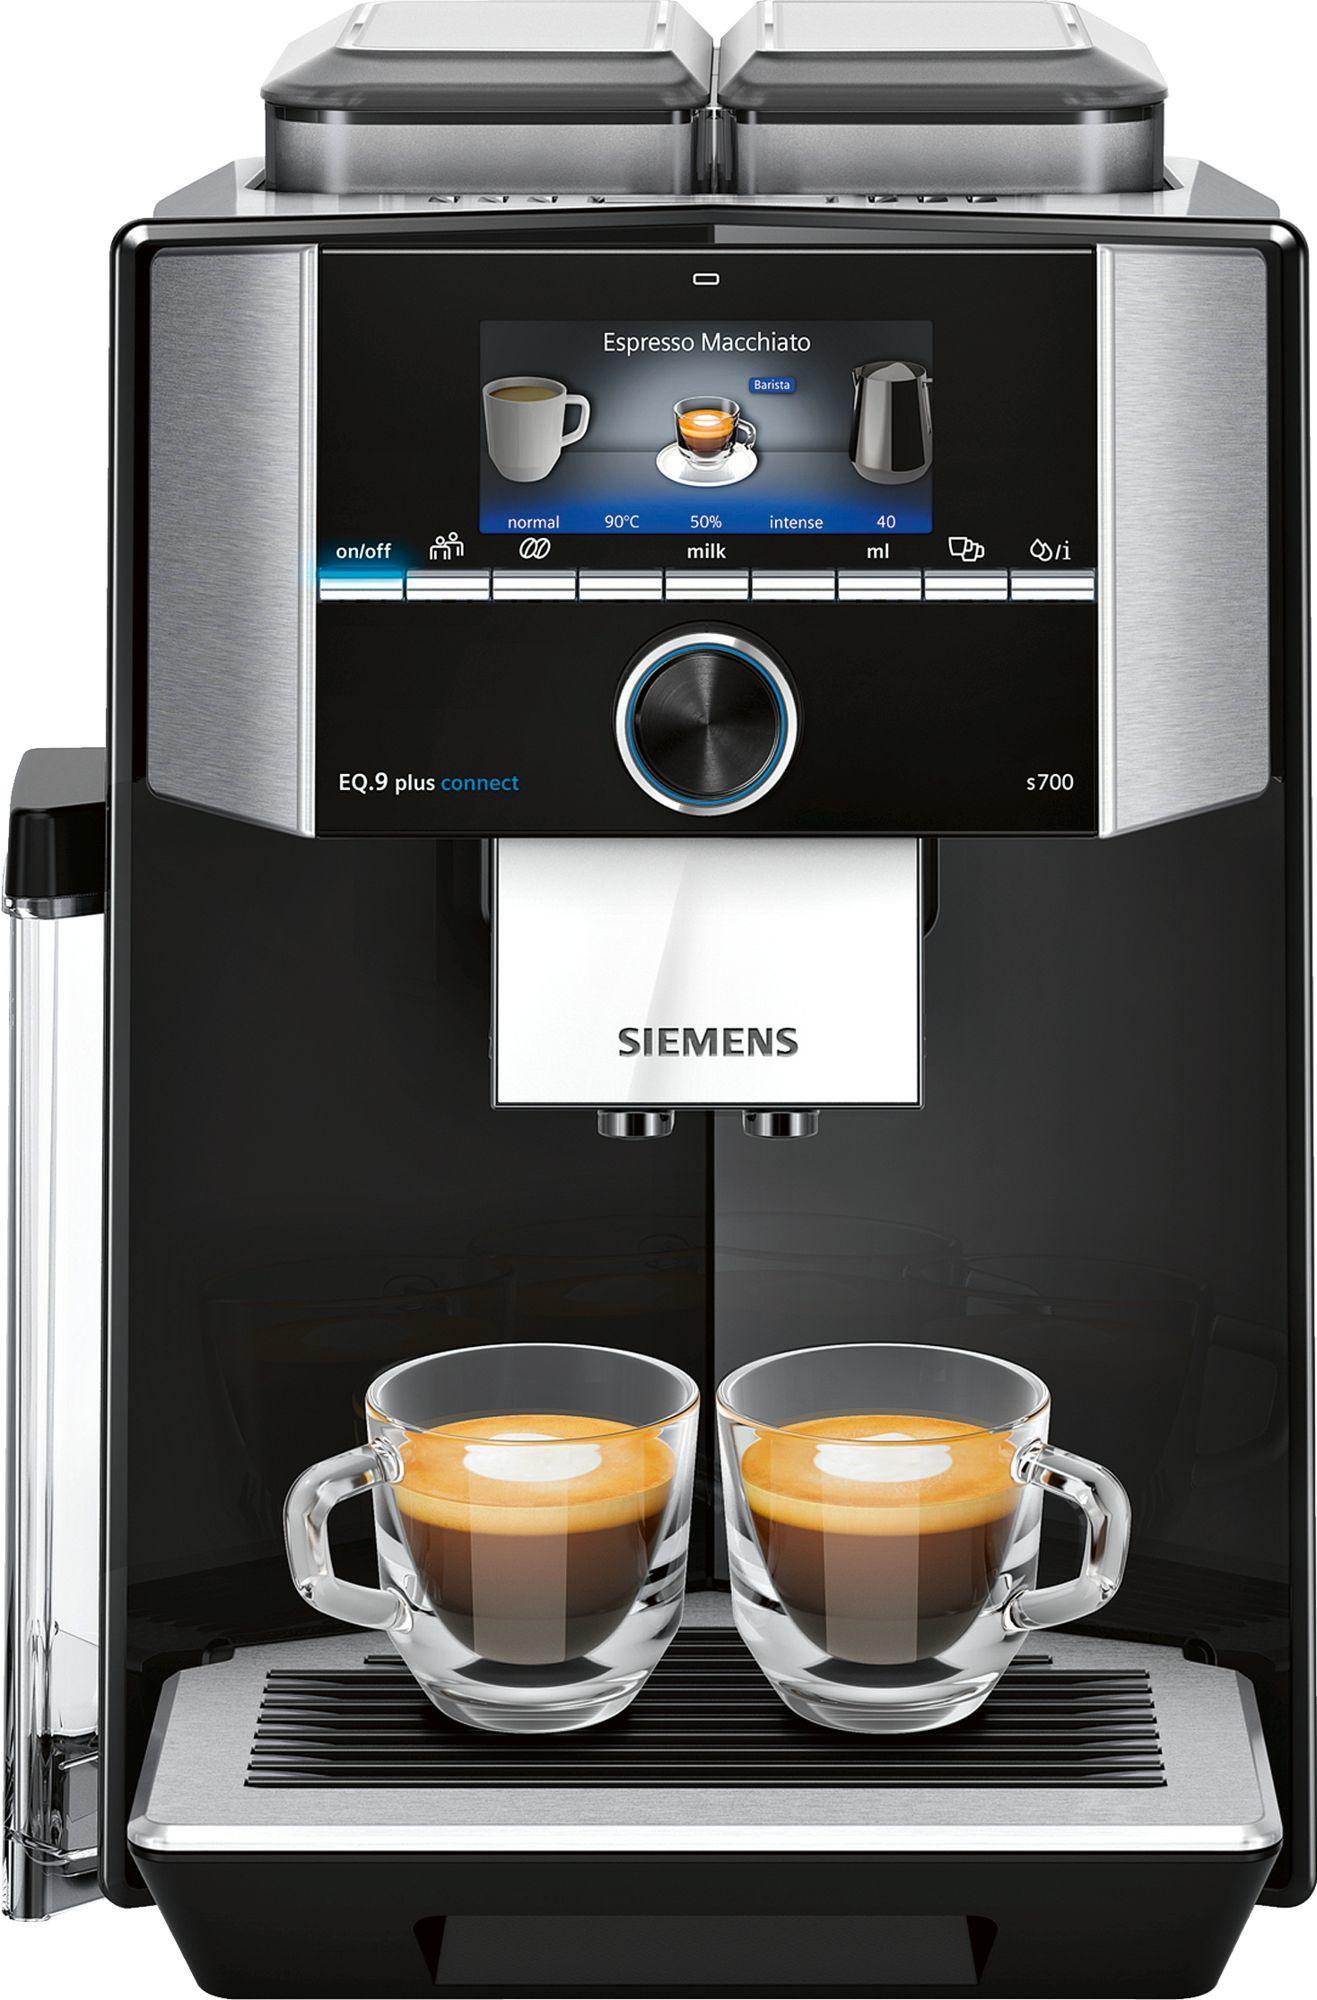 Image of TI9573X9RW EQ.9 plus connect s700 Fully Automatic Coffee Machine